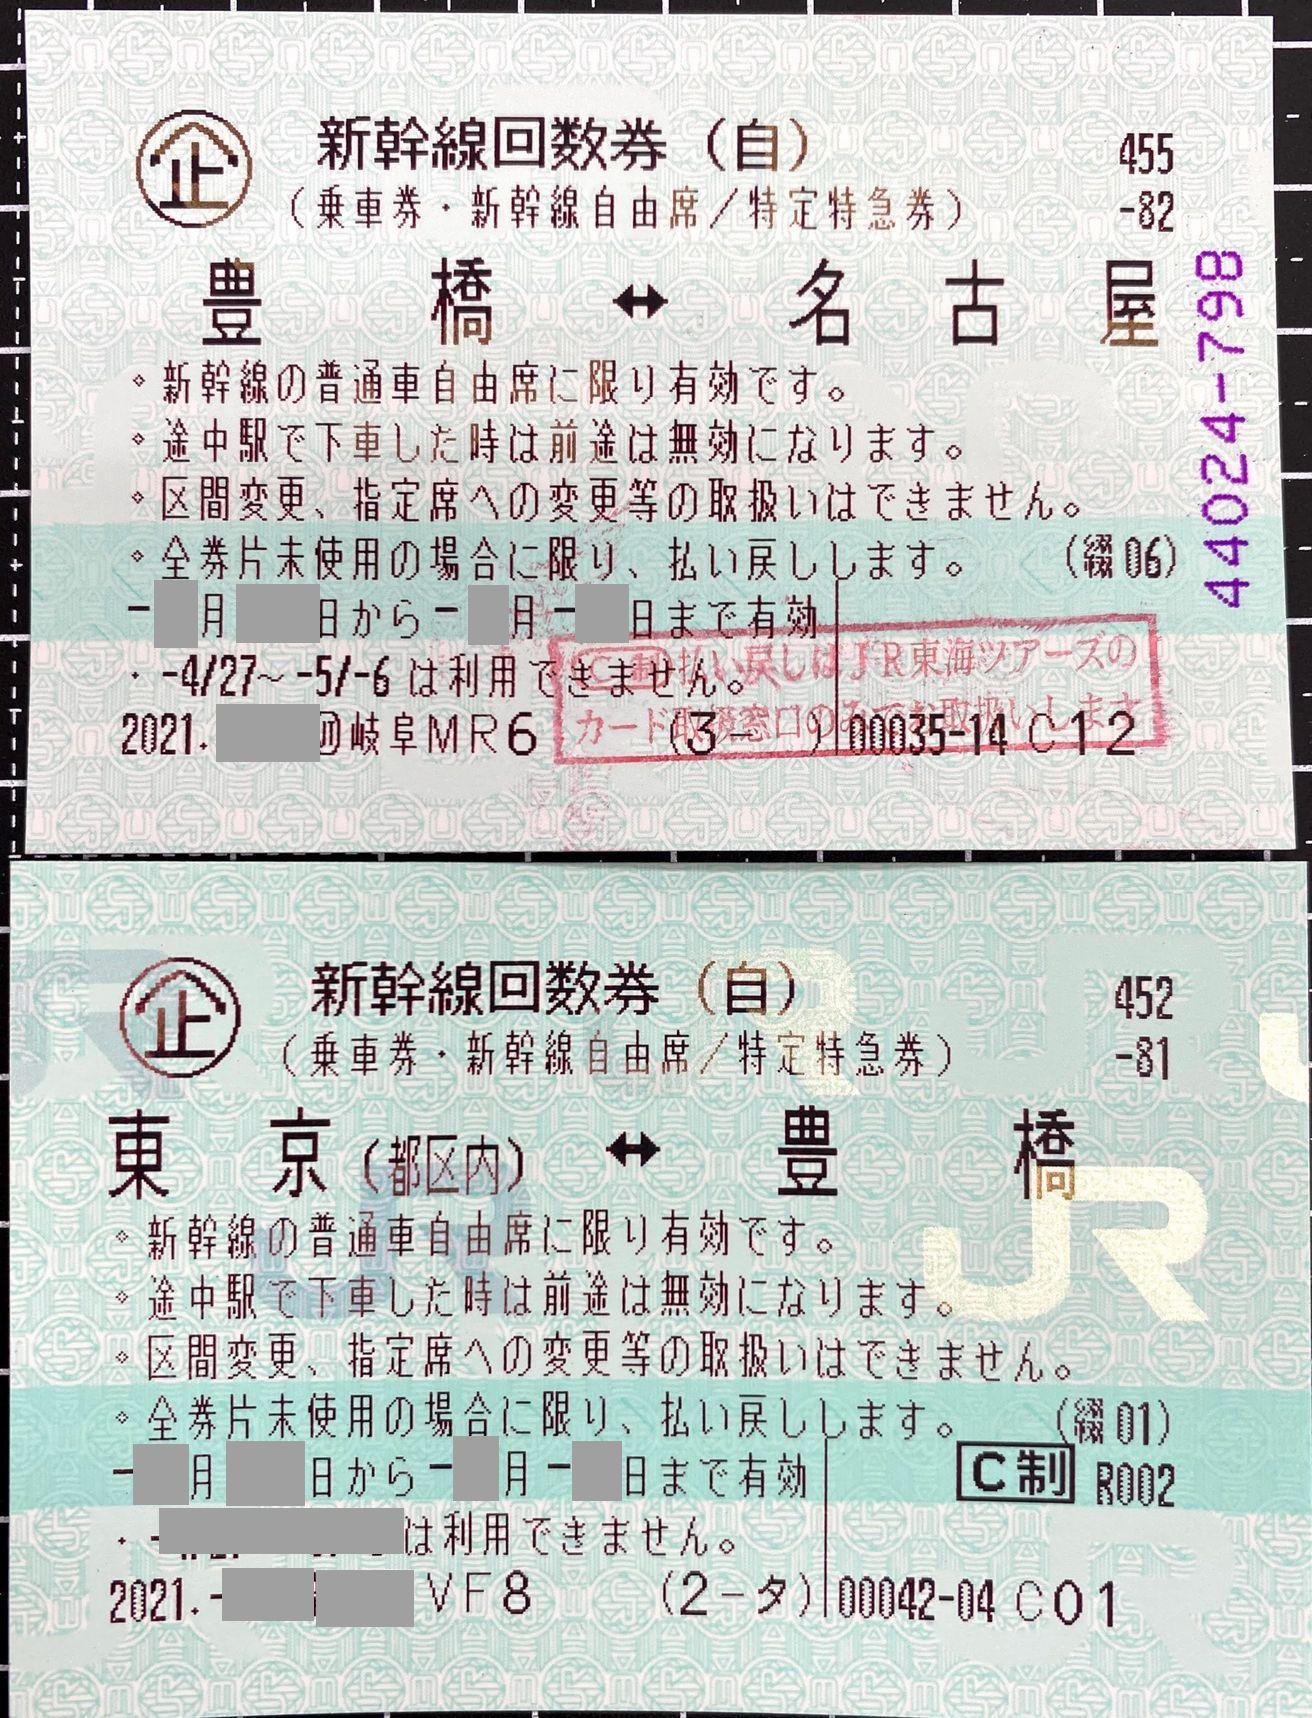 JR 名古屋~東京都区内自由席 新幹線回数券